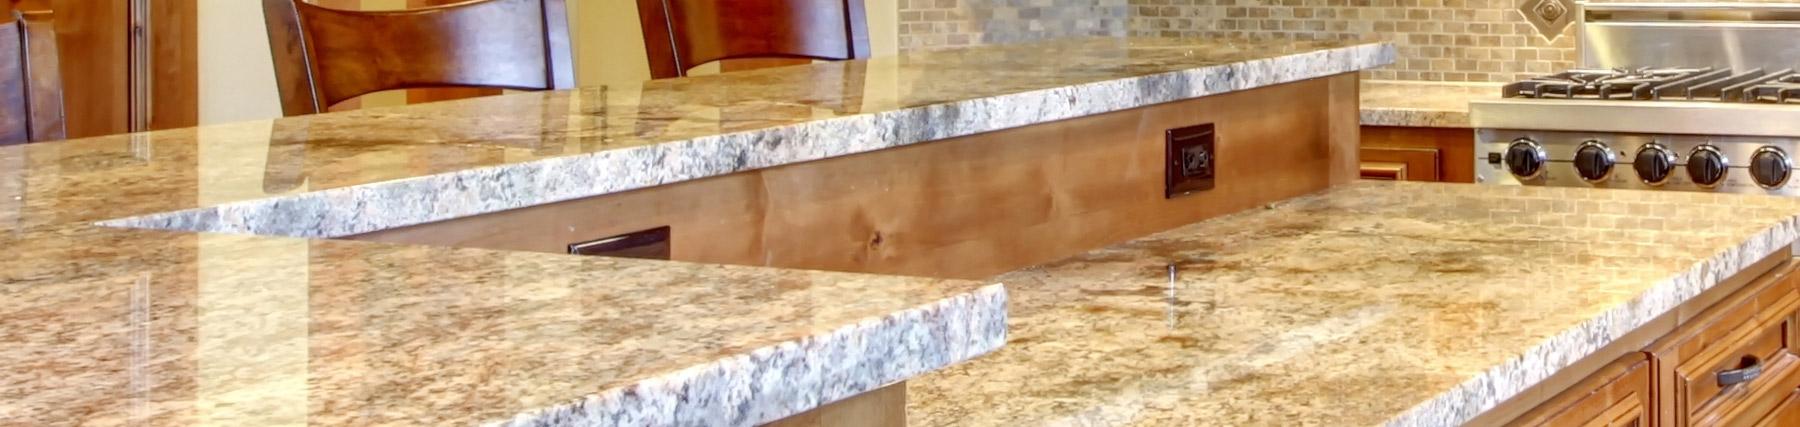 Home Gallery Specials Stone Colors Kitchen Designer Estimator Contact